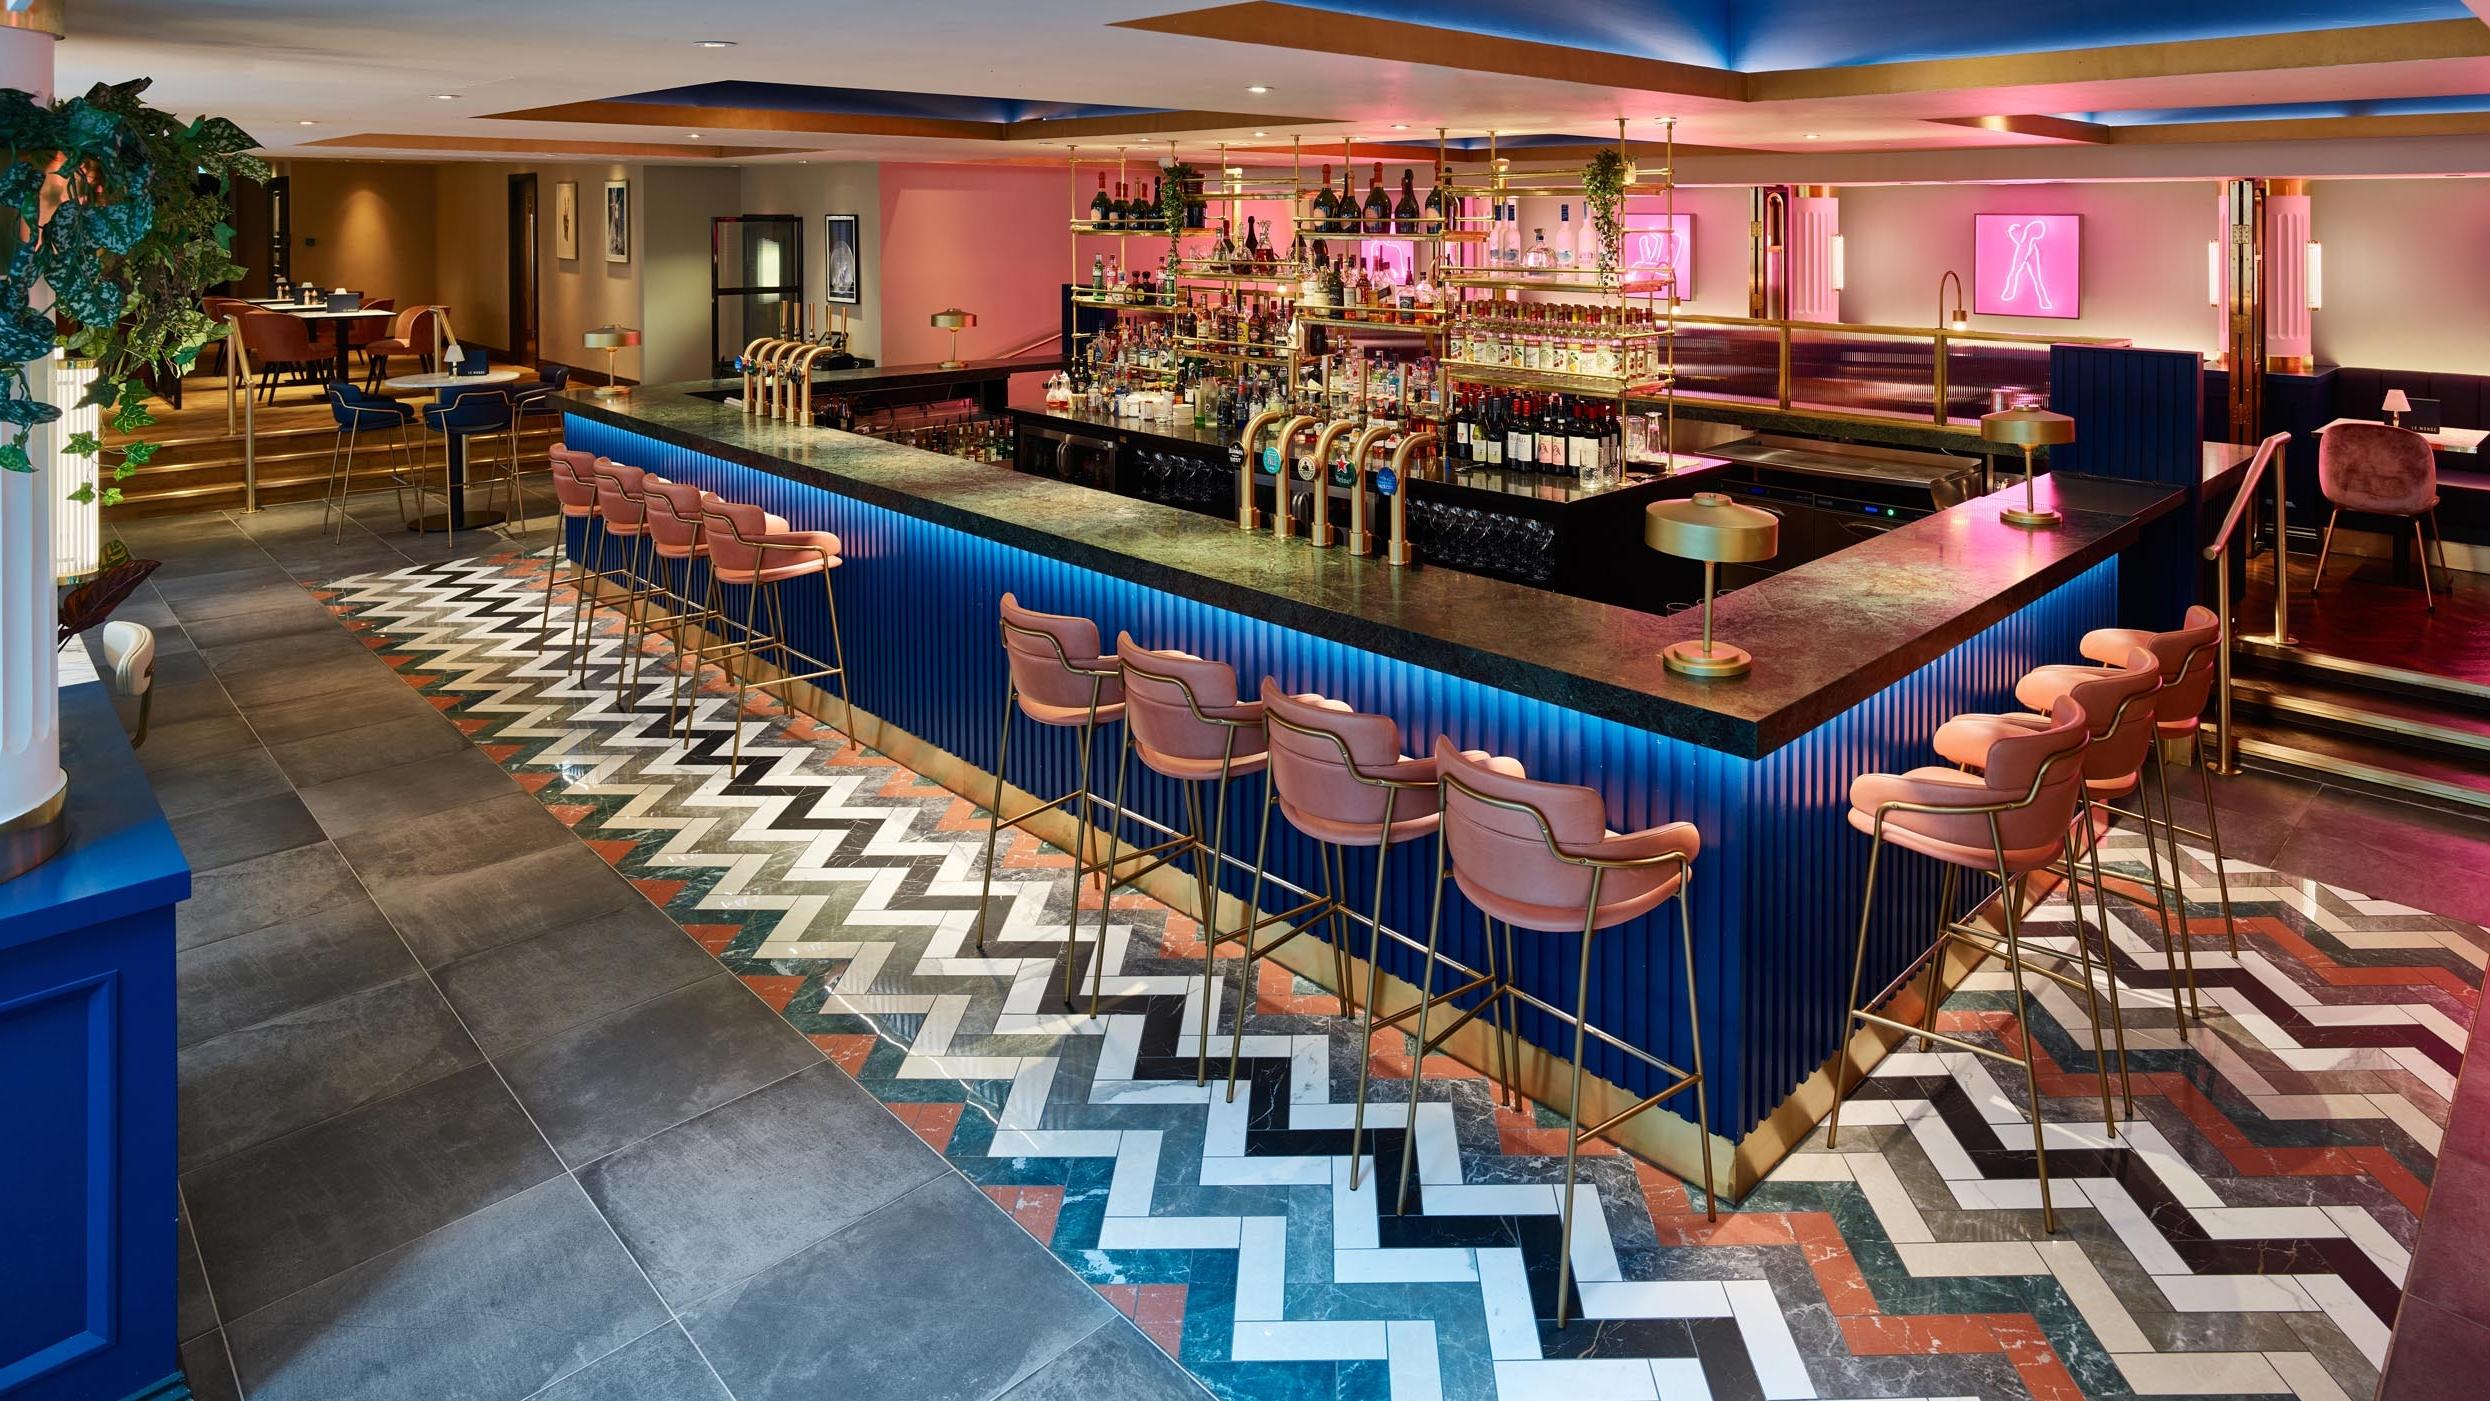 Le Monde Bar & Restaurant - RYE Design